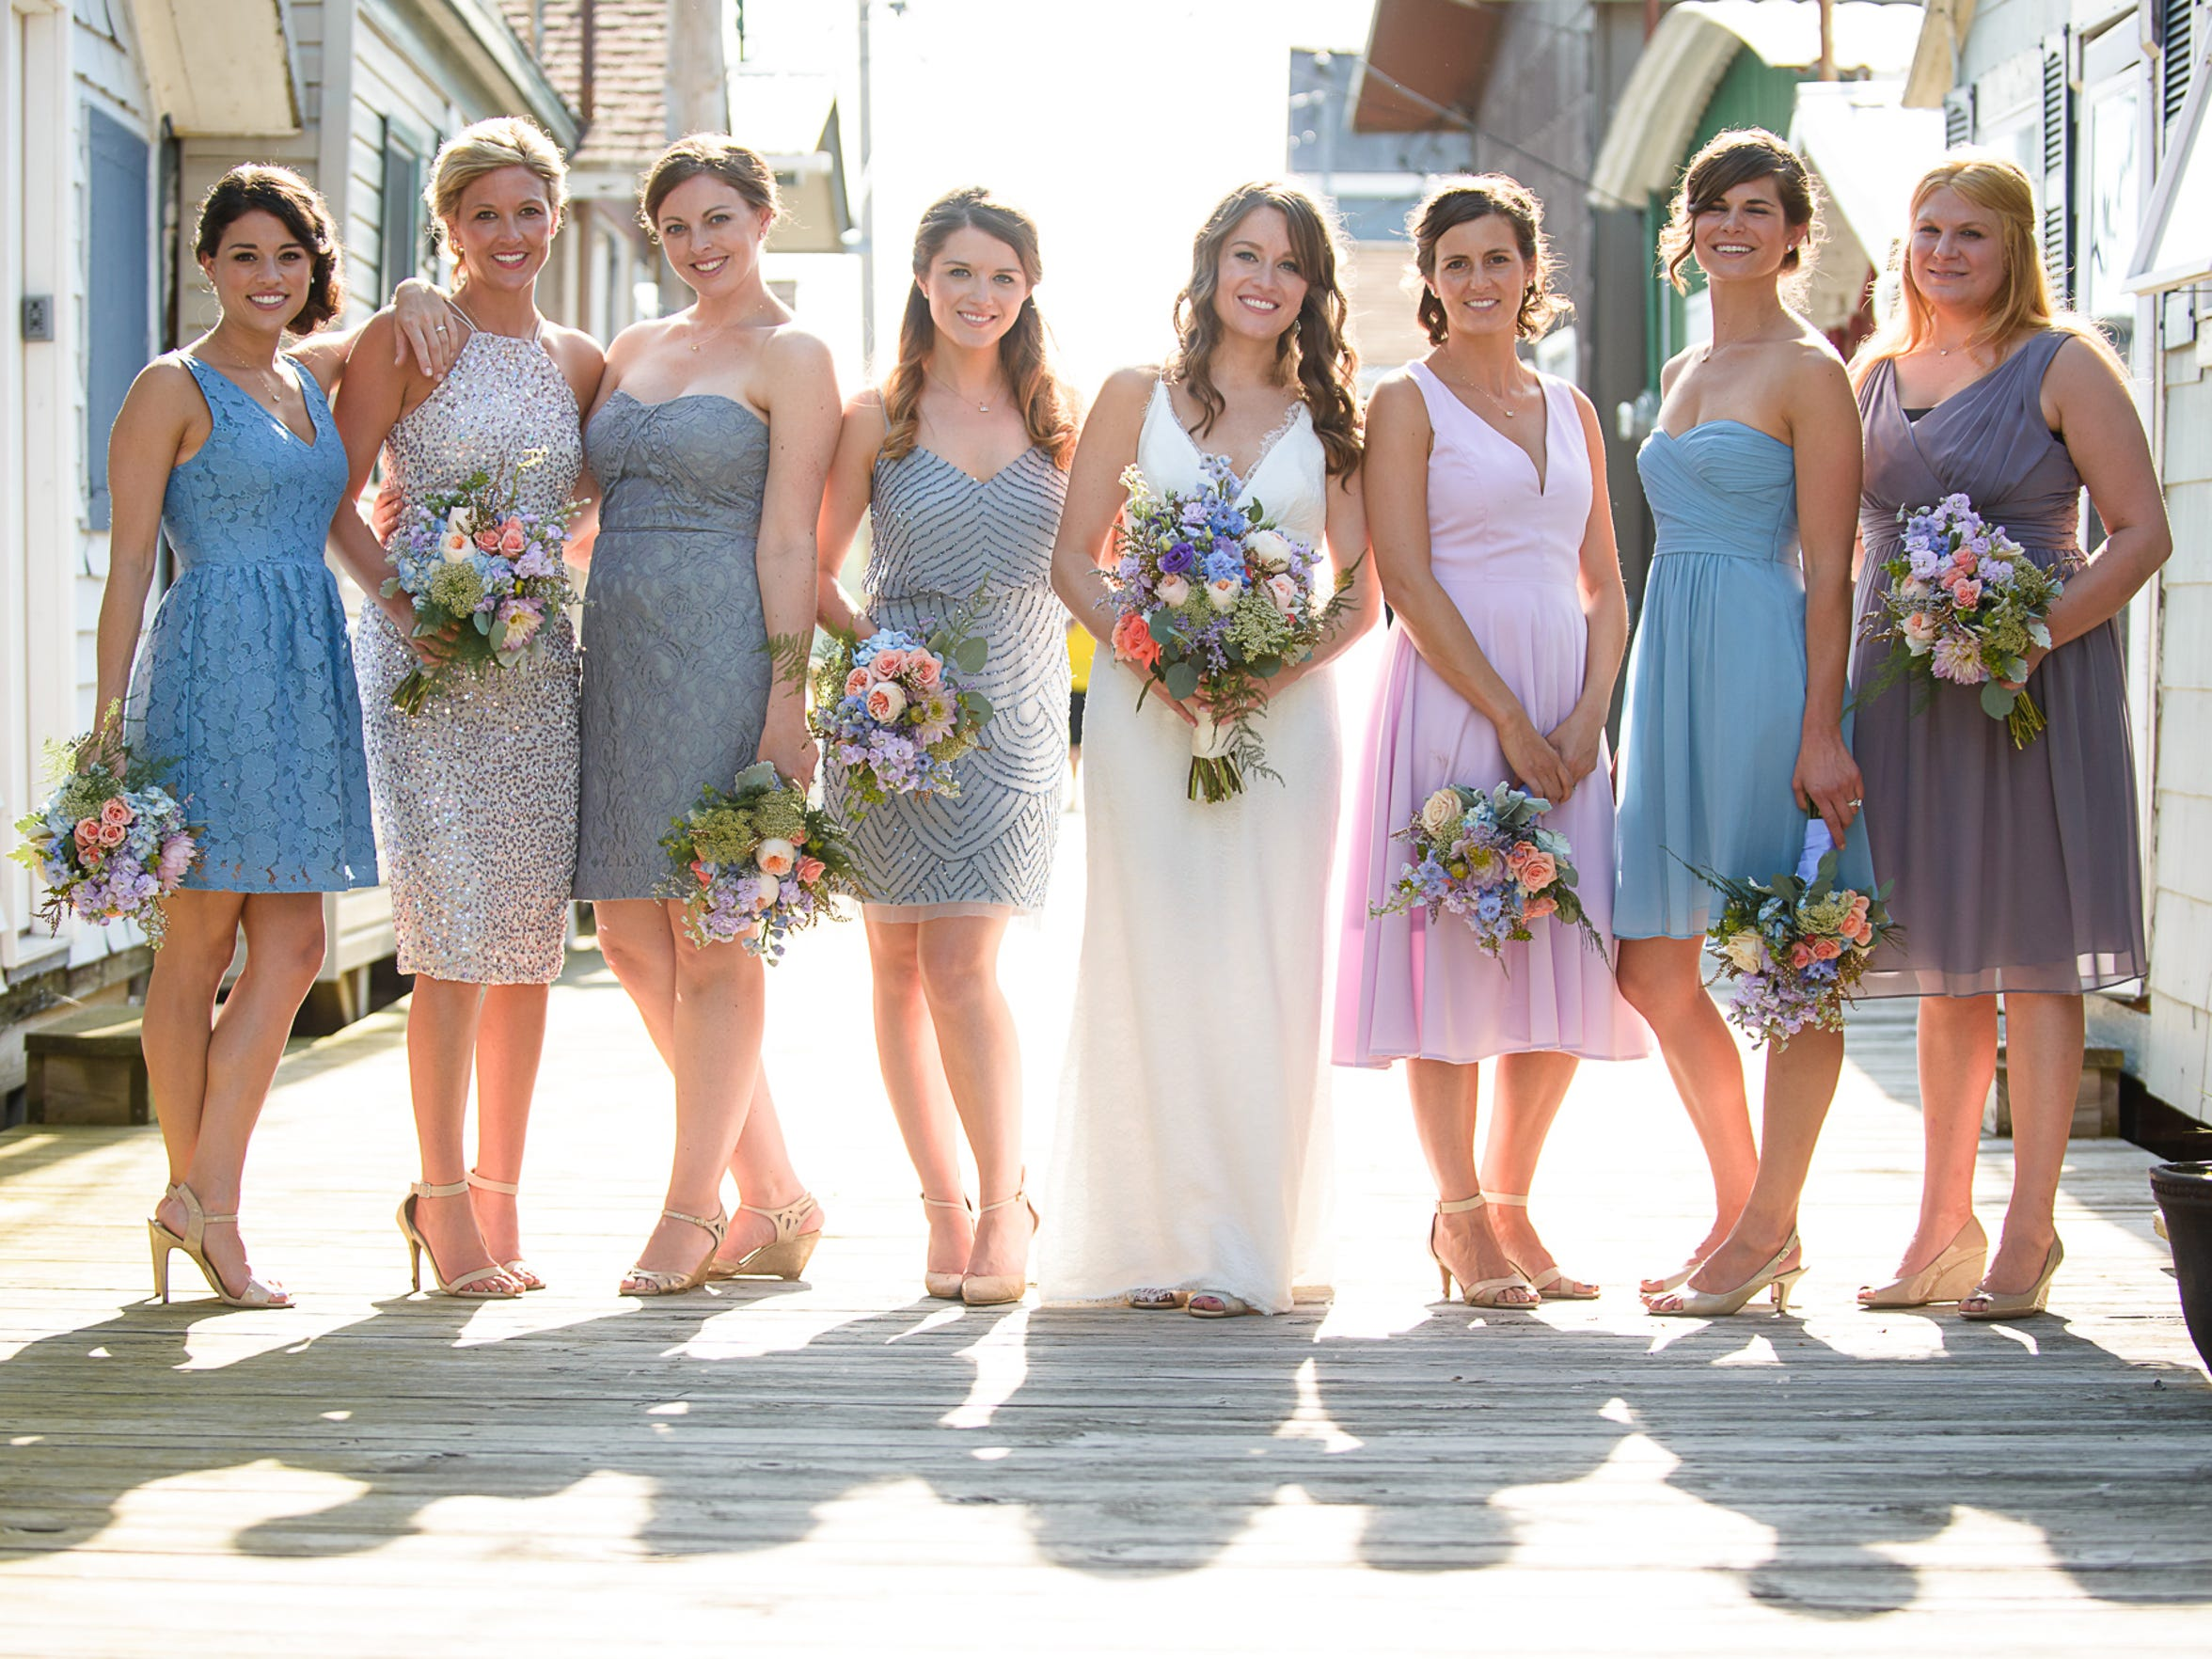 Mix-and-match bridesmaid dresses